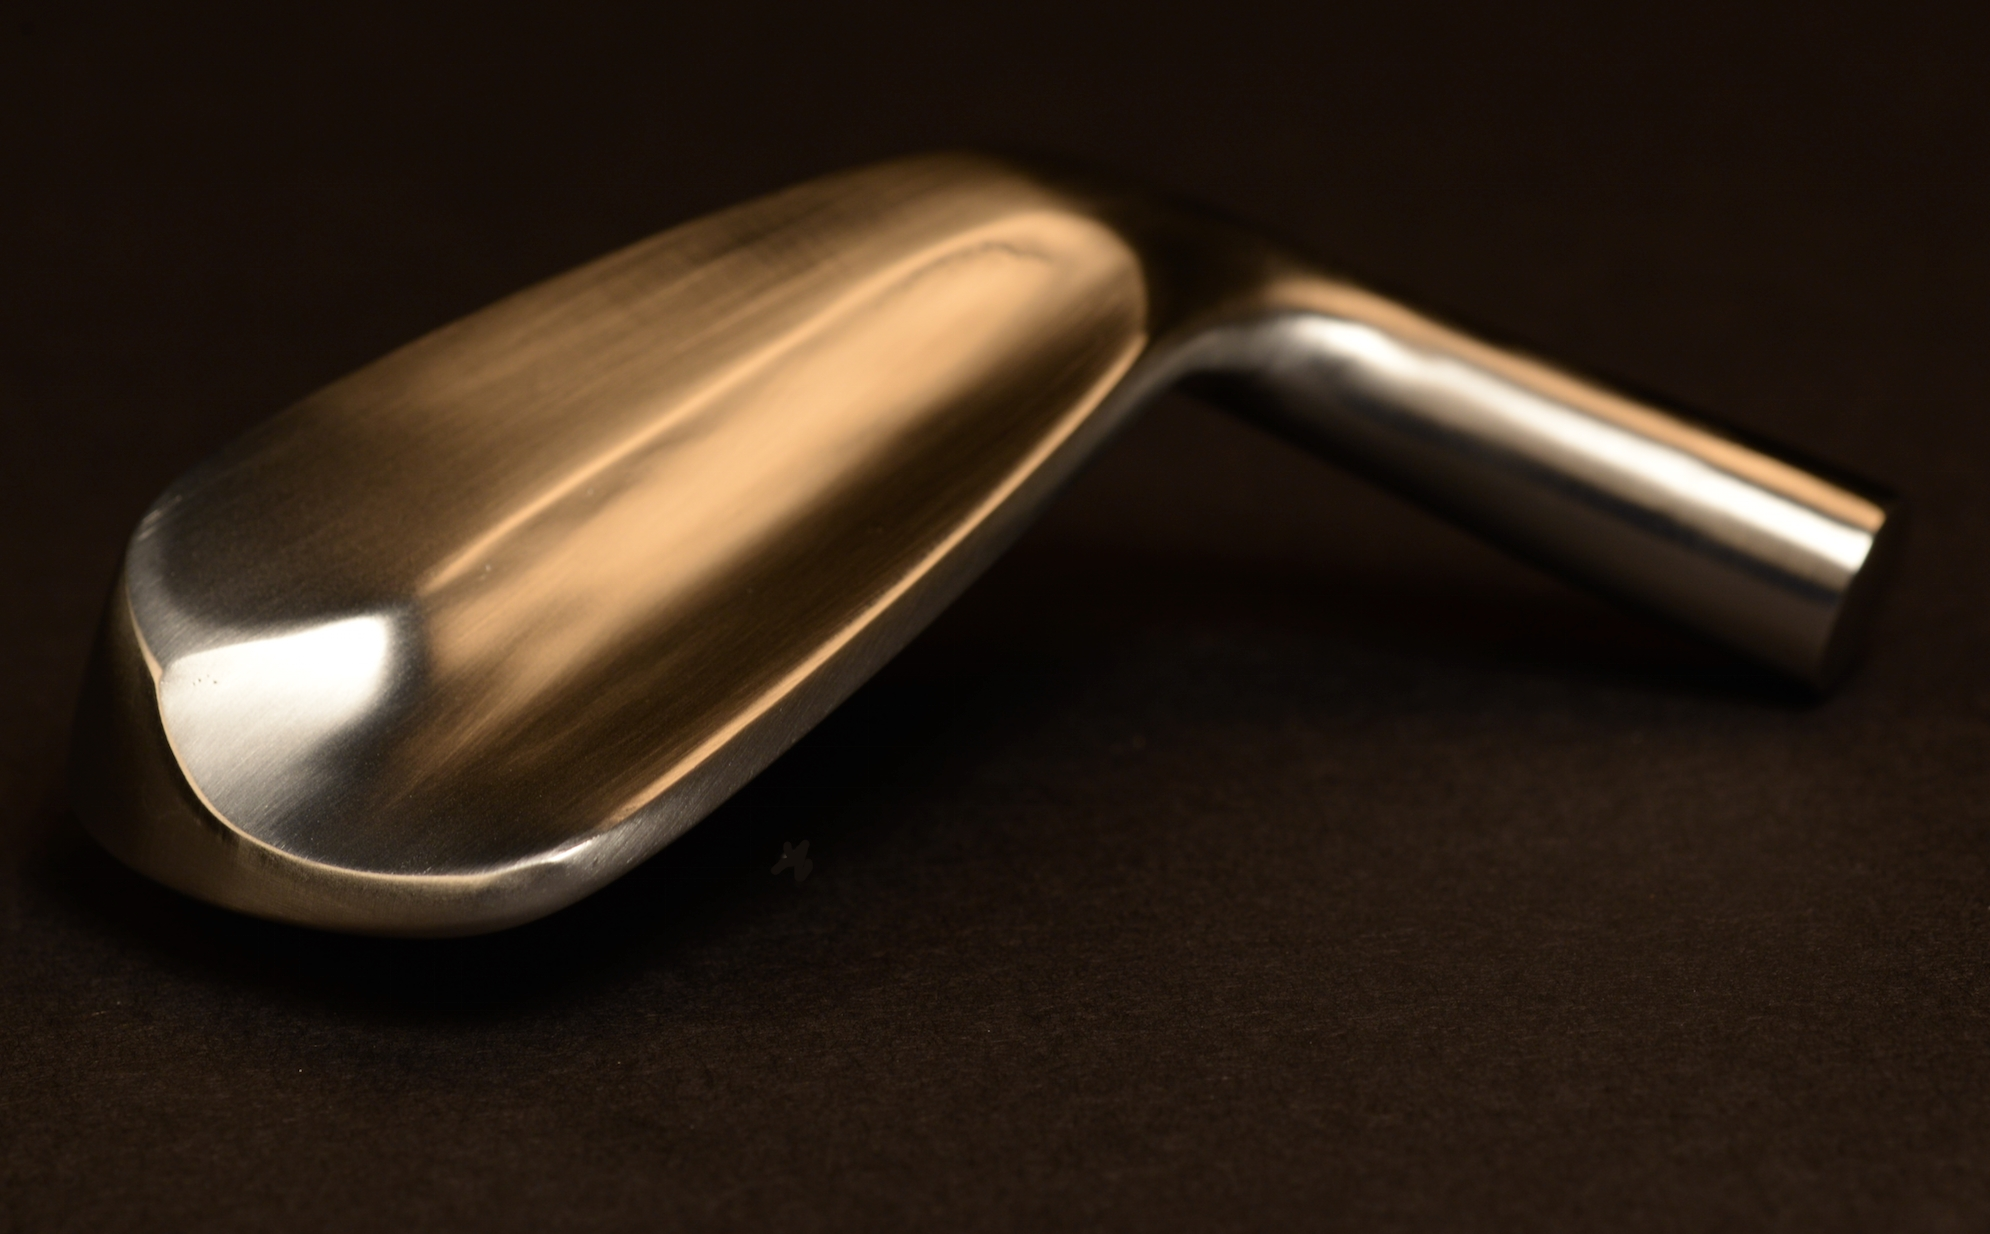 P53 Authentic American Irons Image 19.jpg